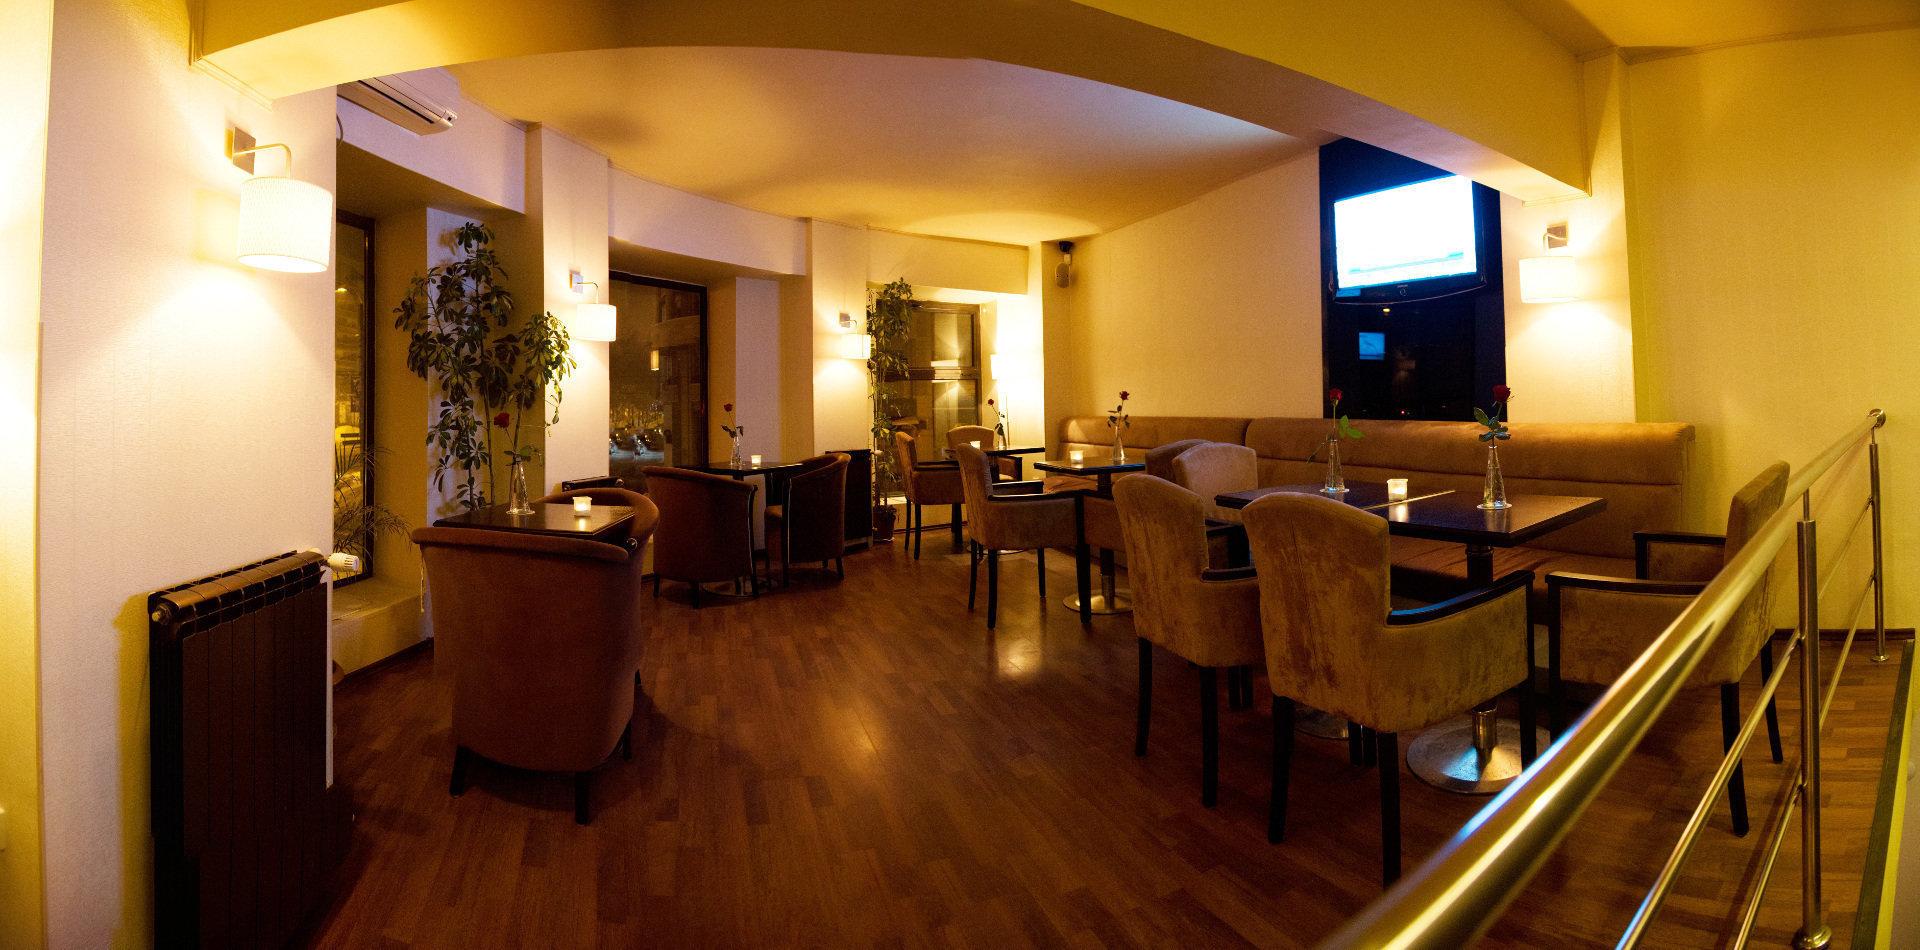 Zvon Café Decebal: A Work-Friendly Place in Bucharest